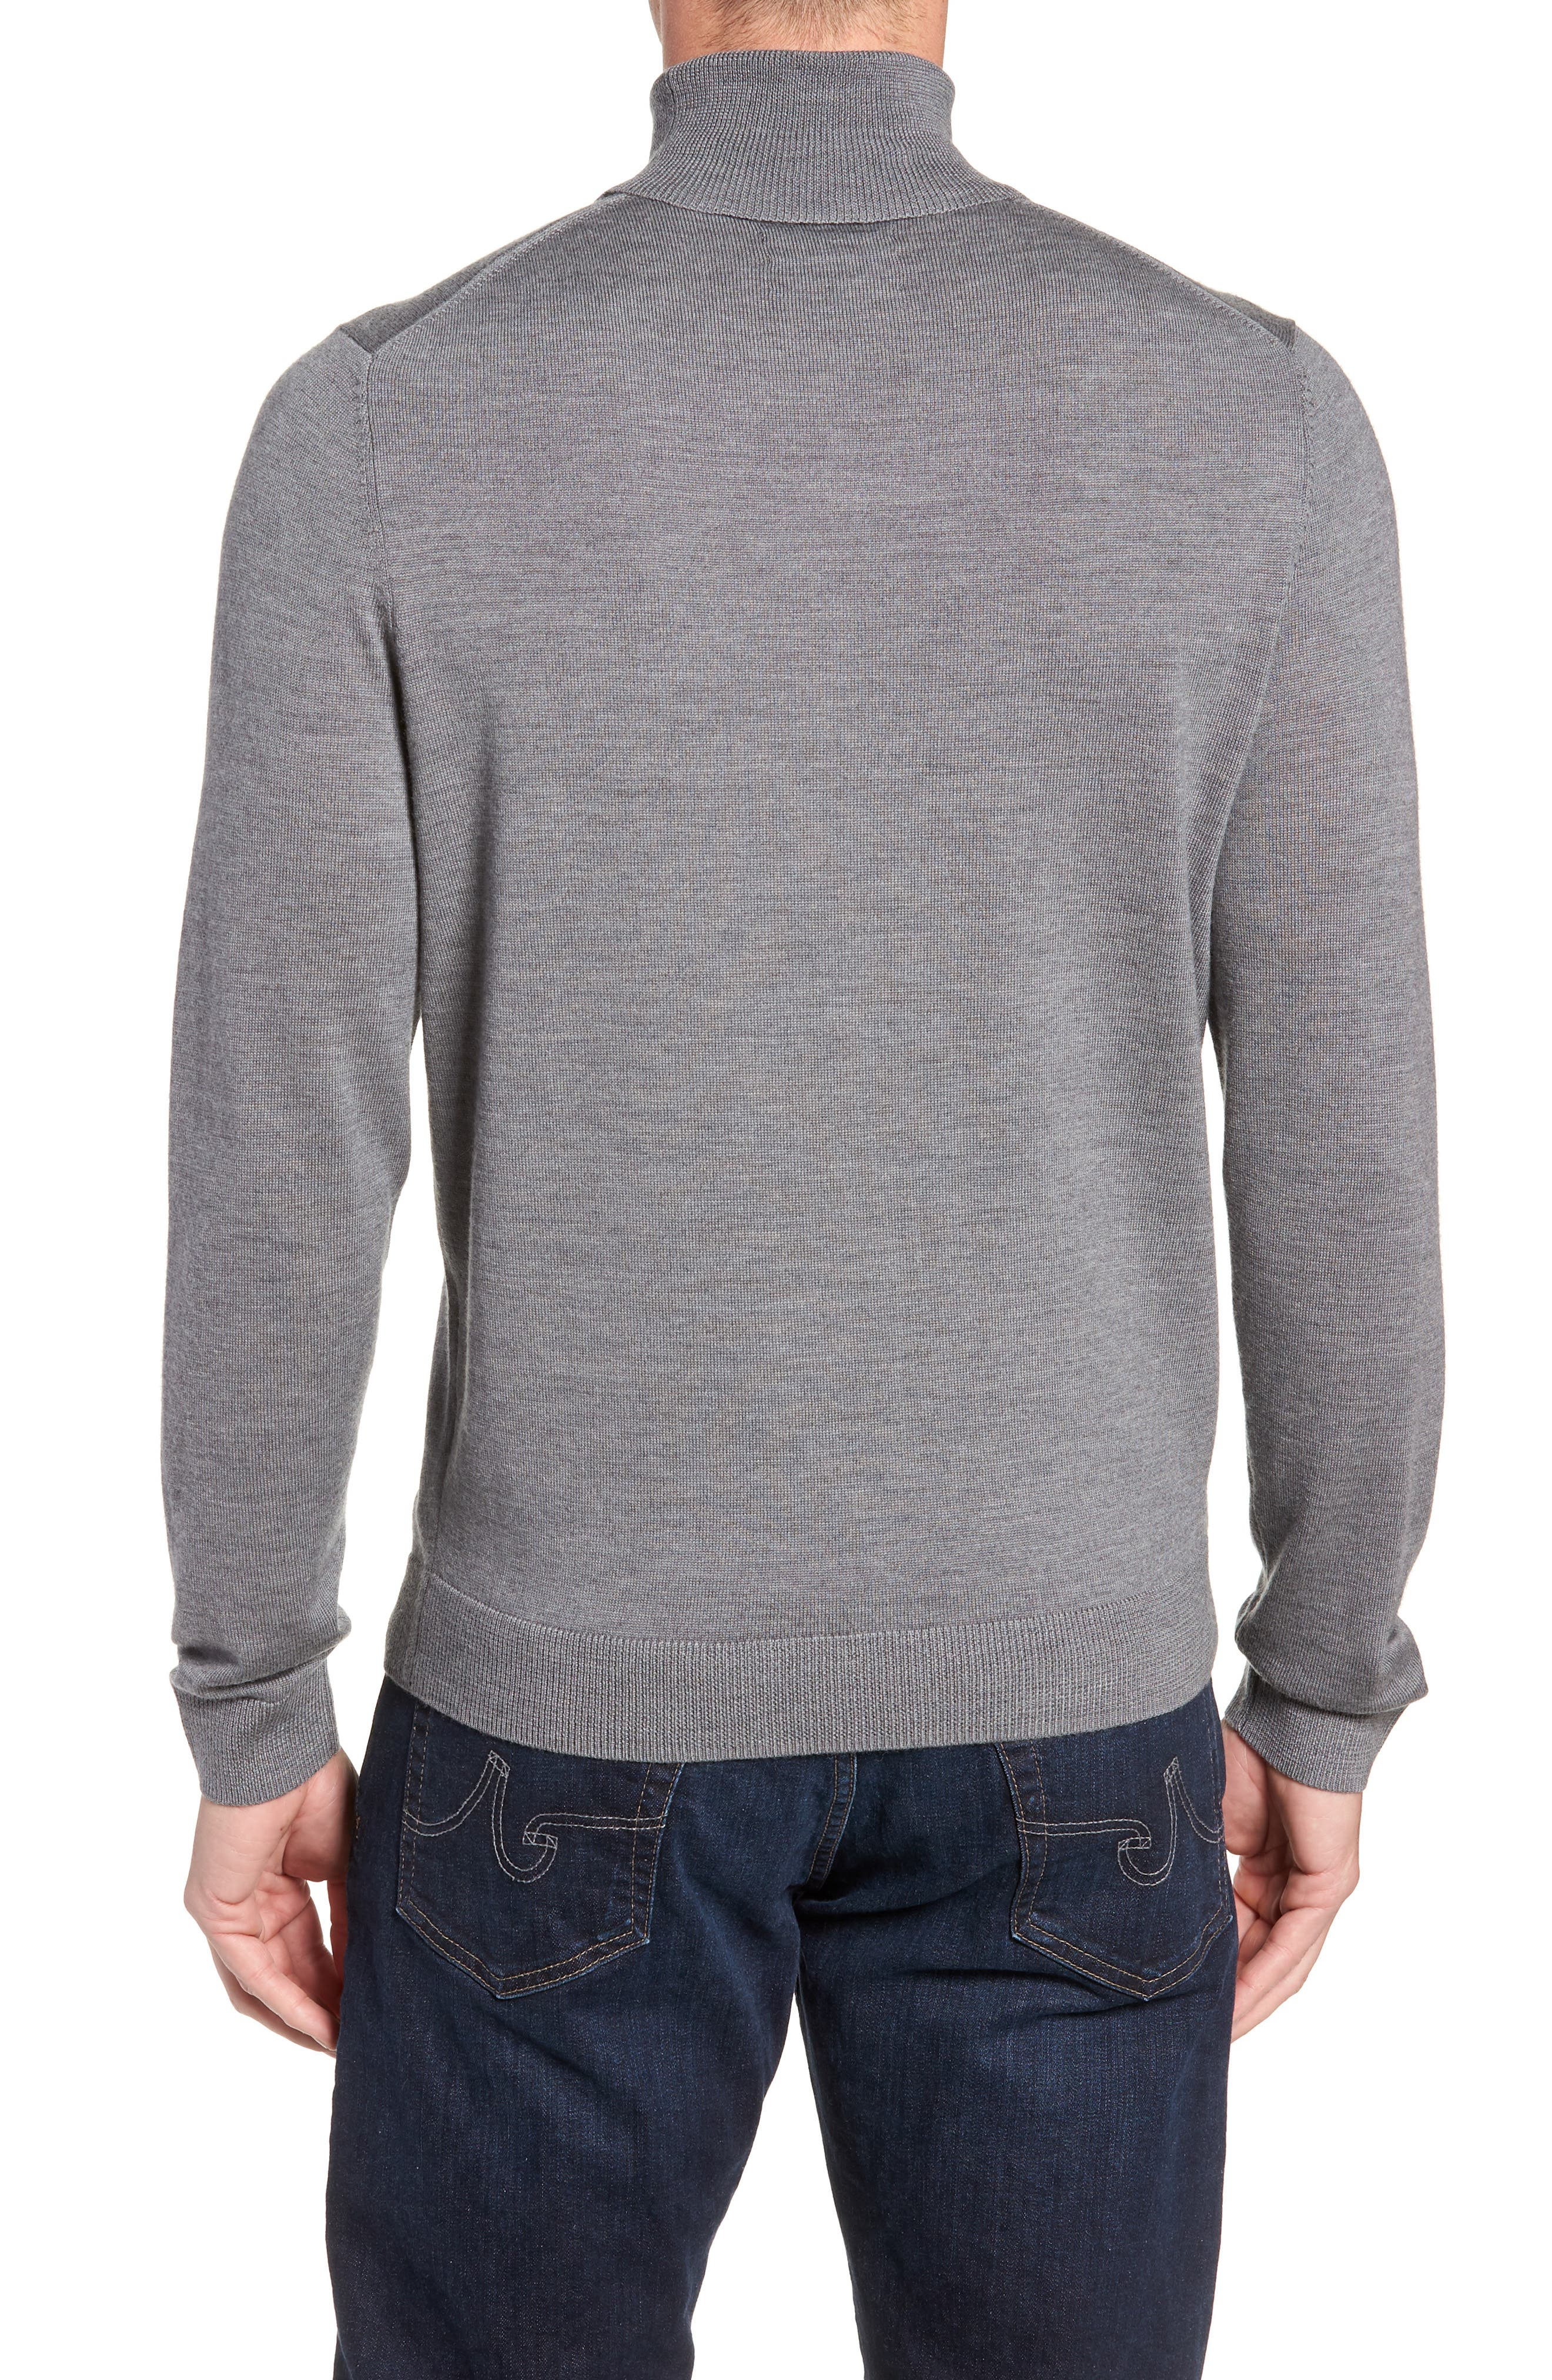 Merino Wool Turtleneck Sweater,                             Alternate thumbnail 8, color,